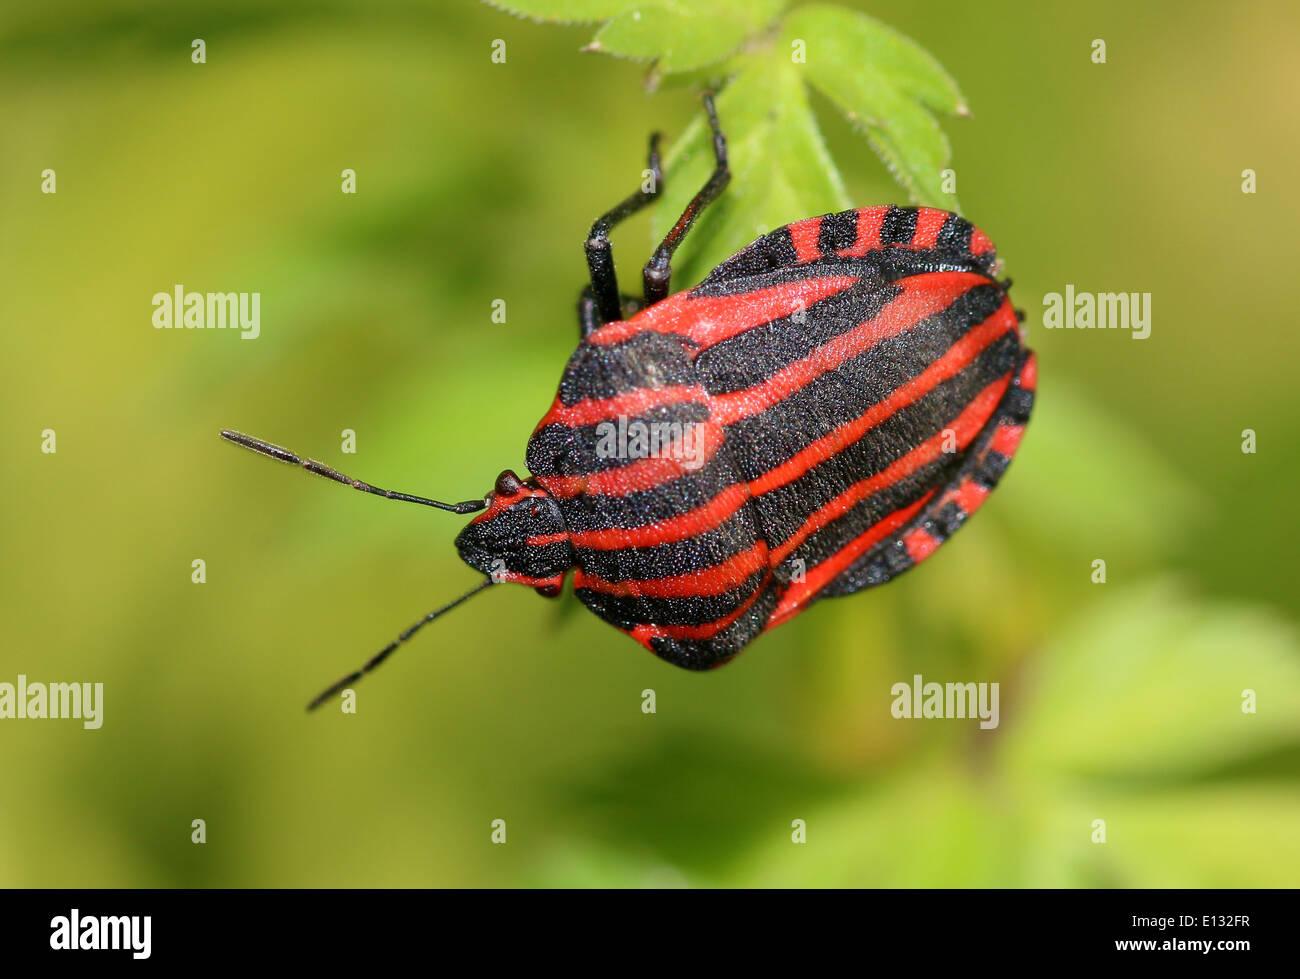 rot und schwarz italienische gestreifte k fer oder minnes nger bug graphosoma lineatum. Black Bedroom Furniture Sets. Home Design Ideas